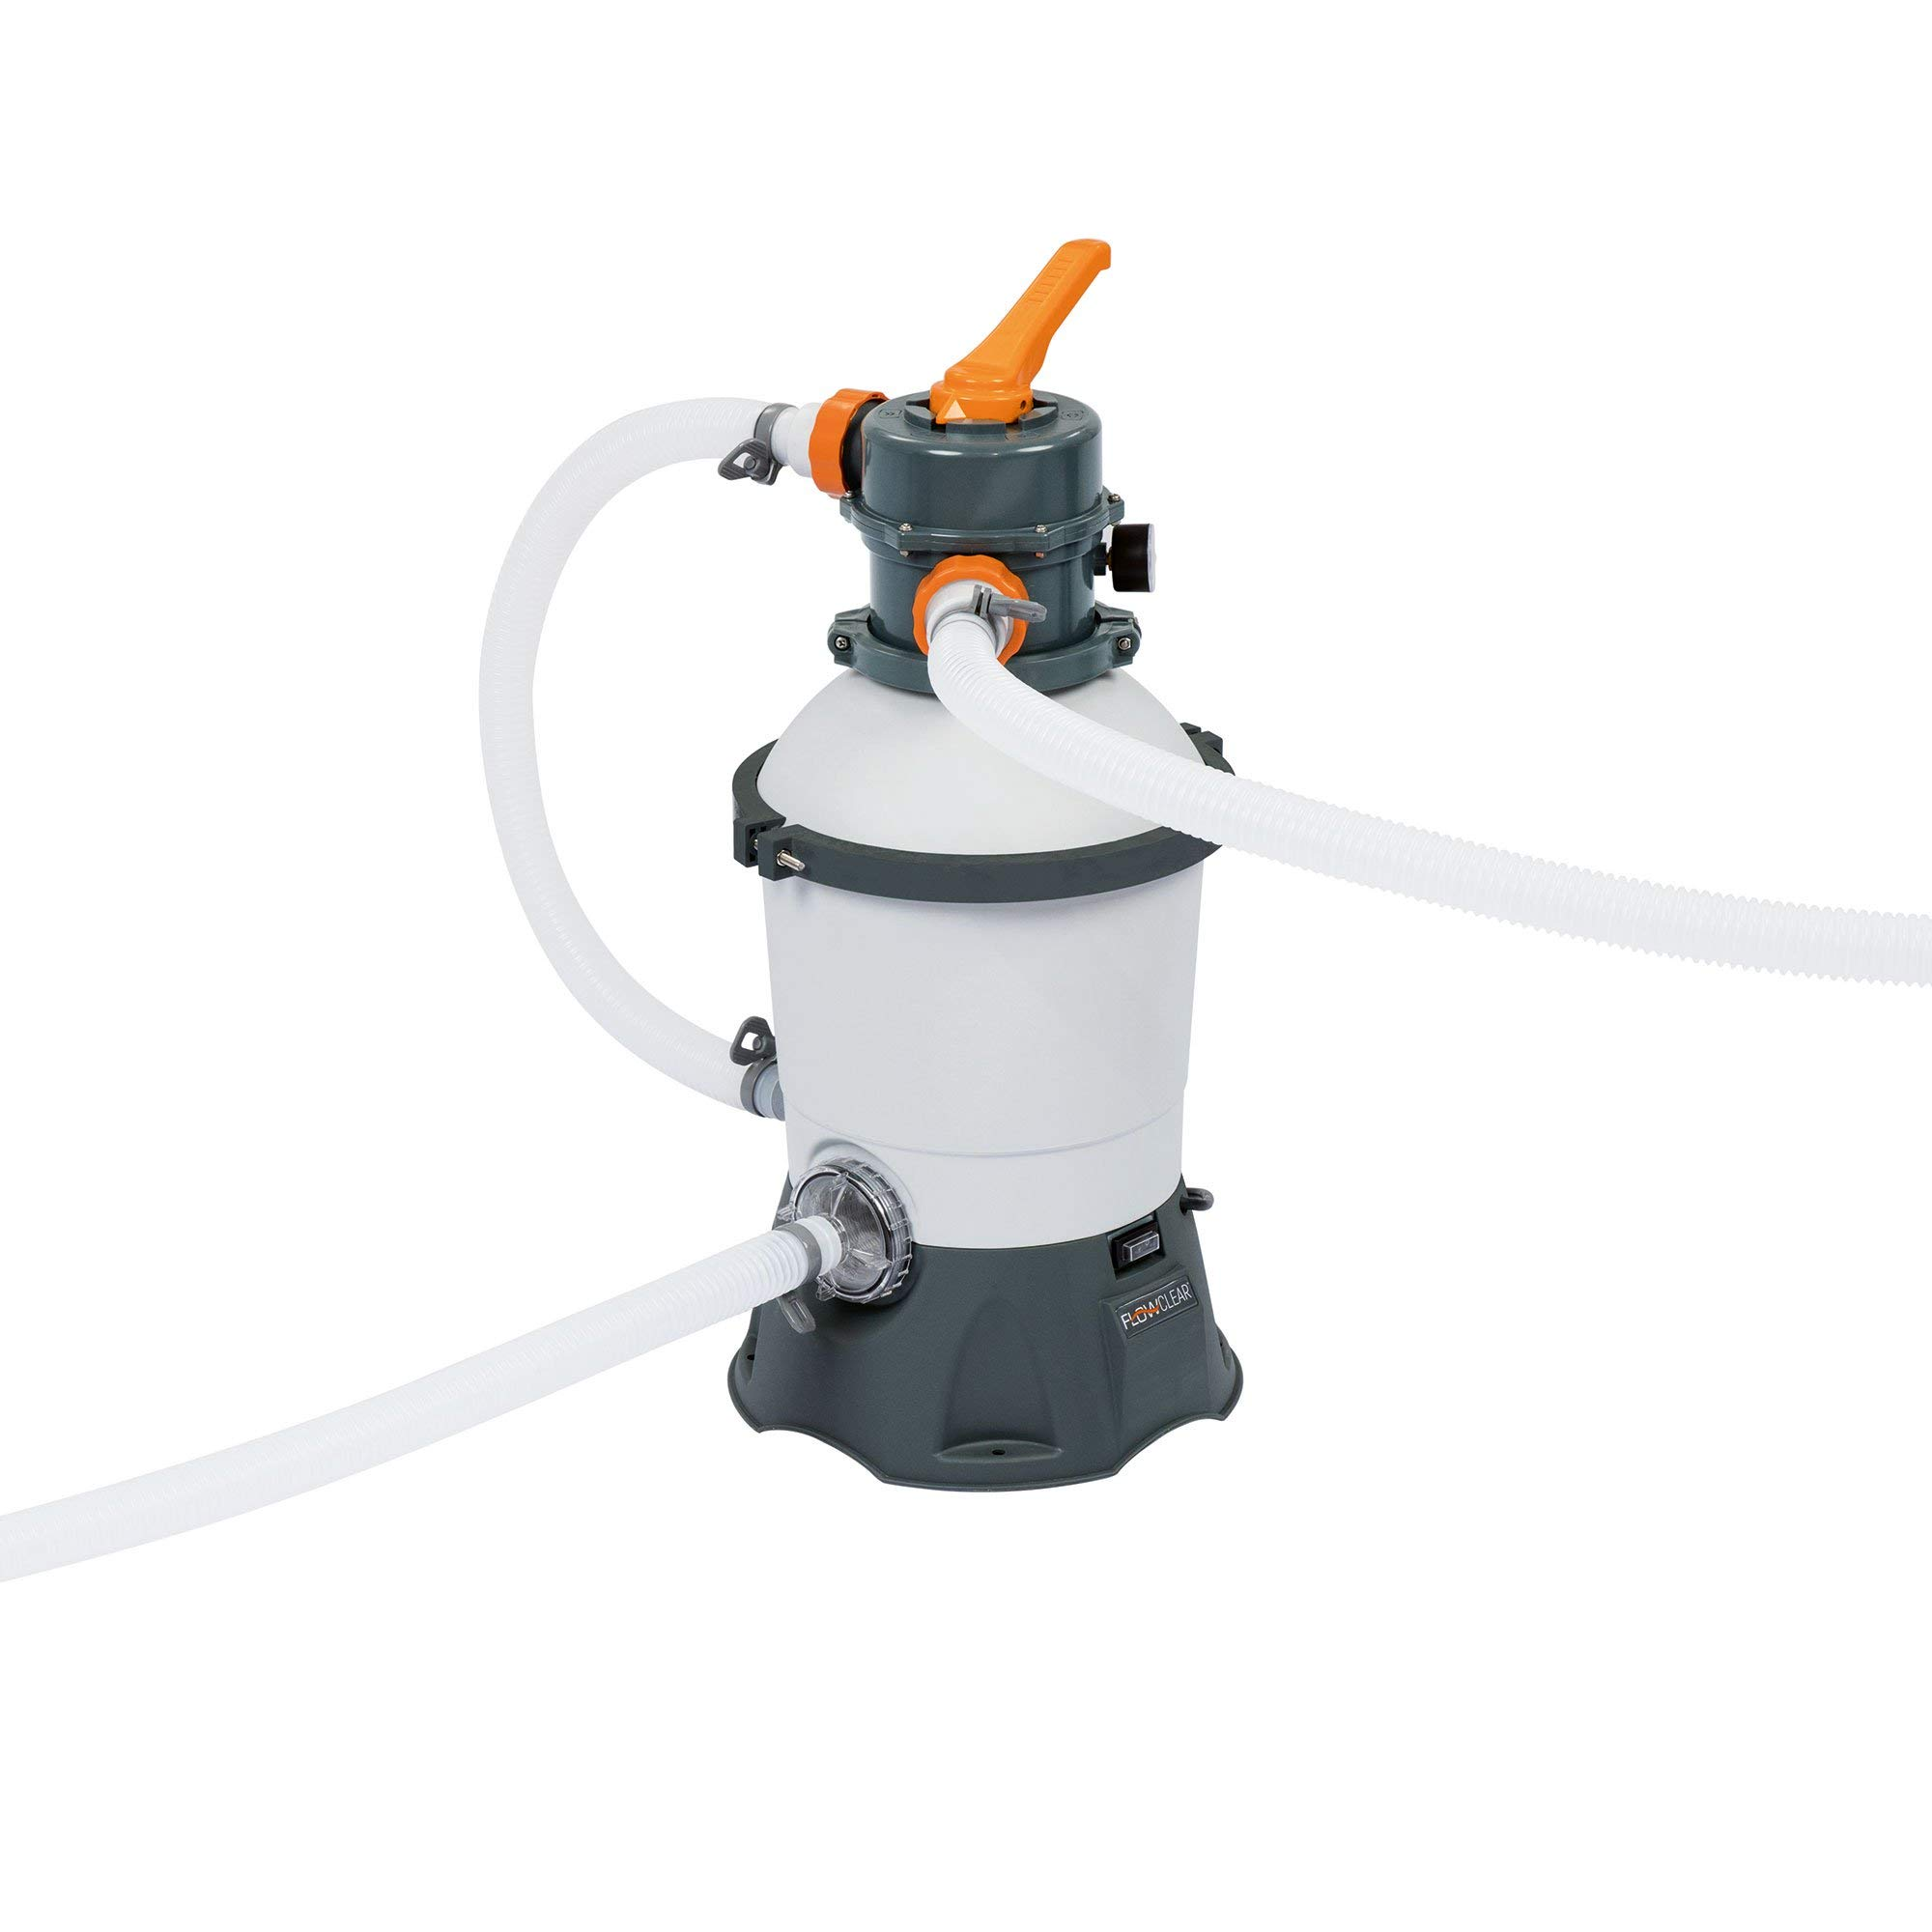 Bestway 58516E Flowclear Pool Pump, Gray by Bestway